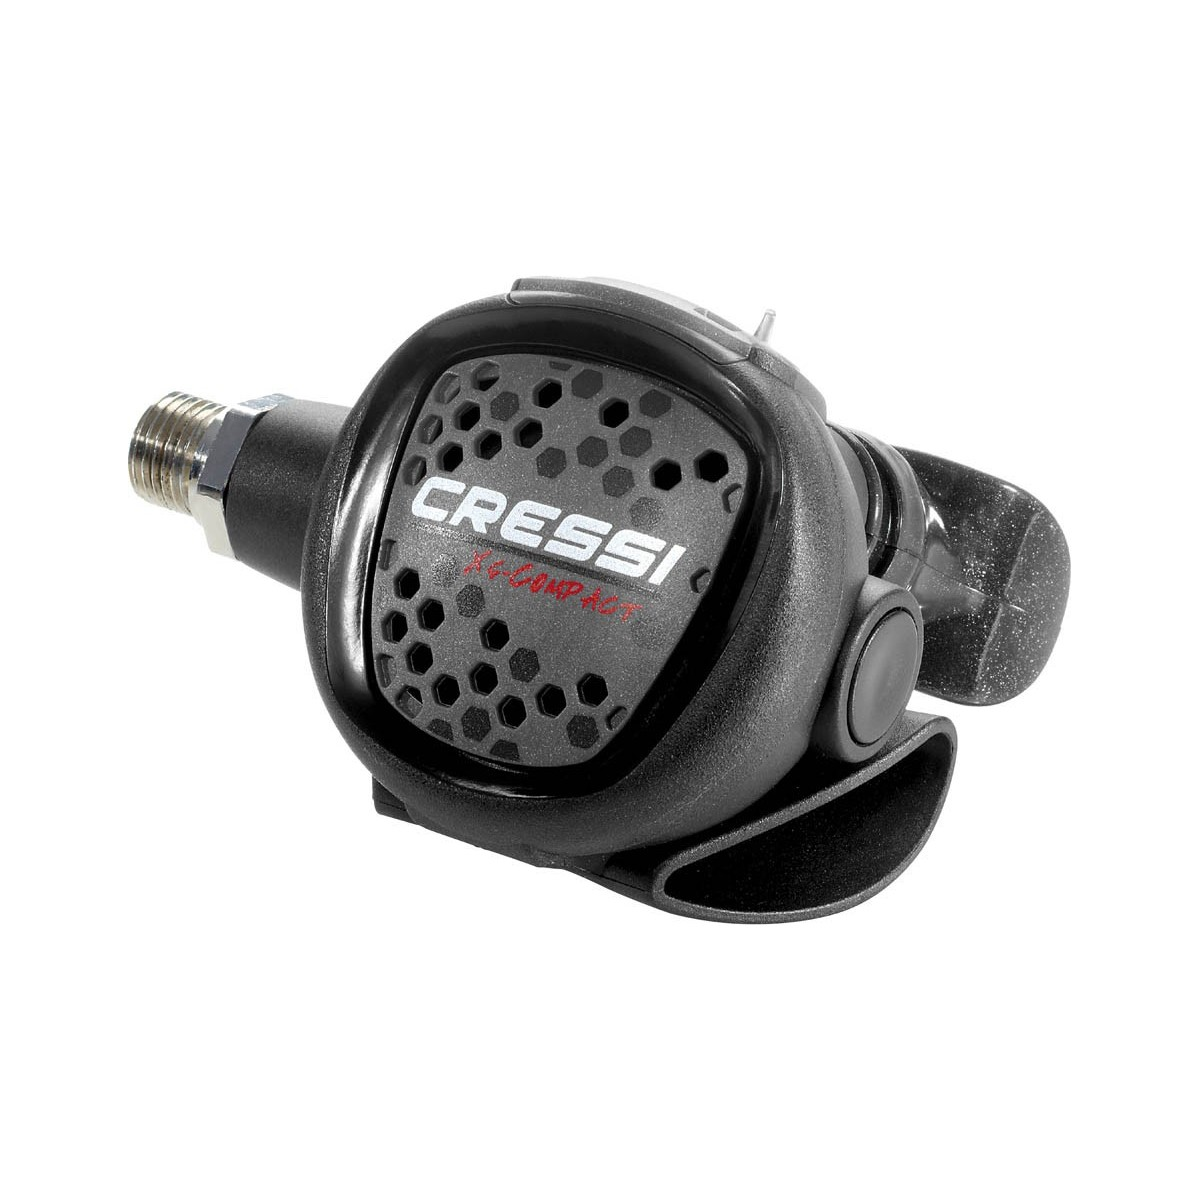 Cressi Compact MC9